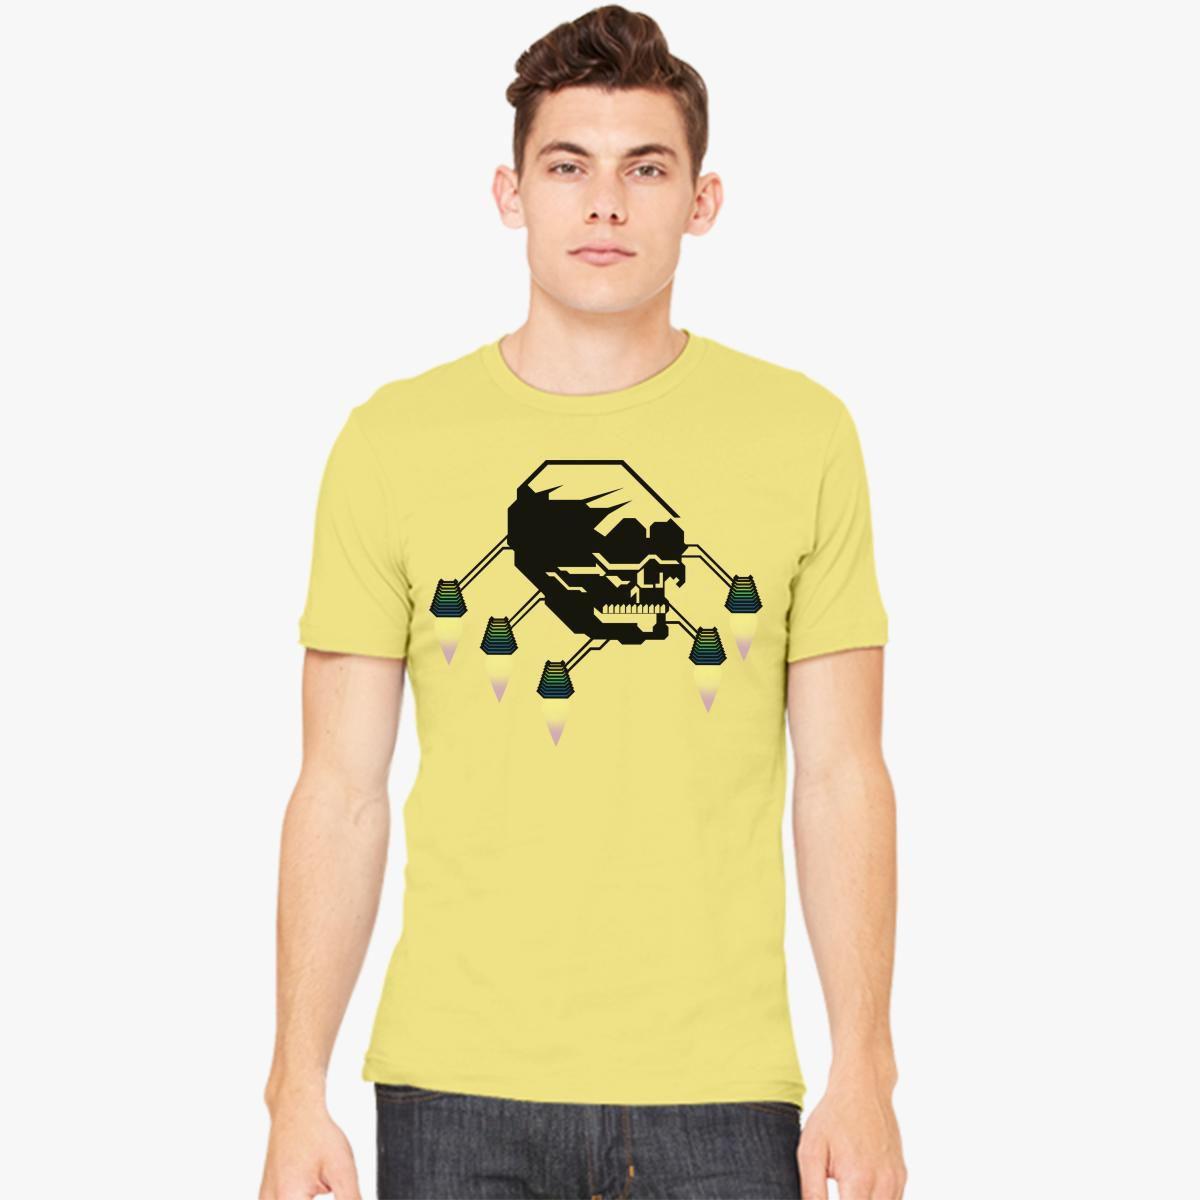 Bastard Noise Men's T-shirt